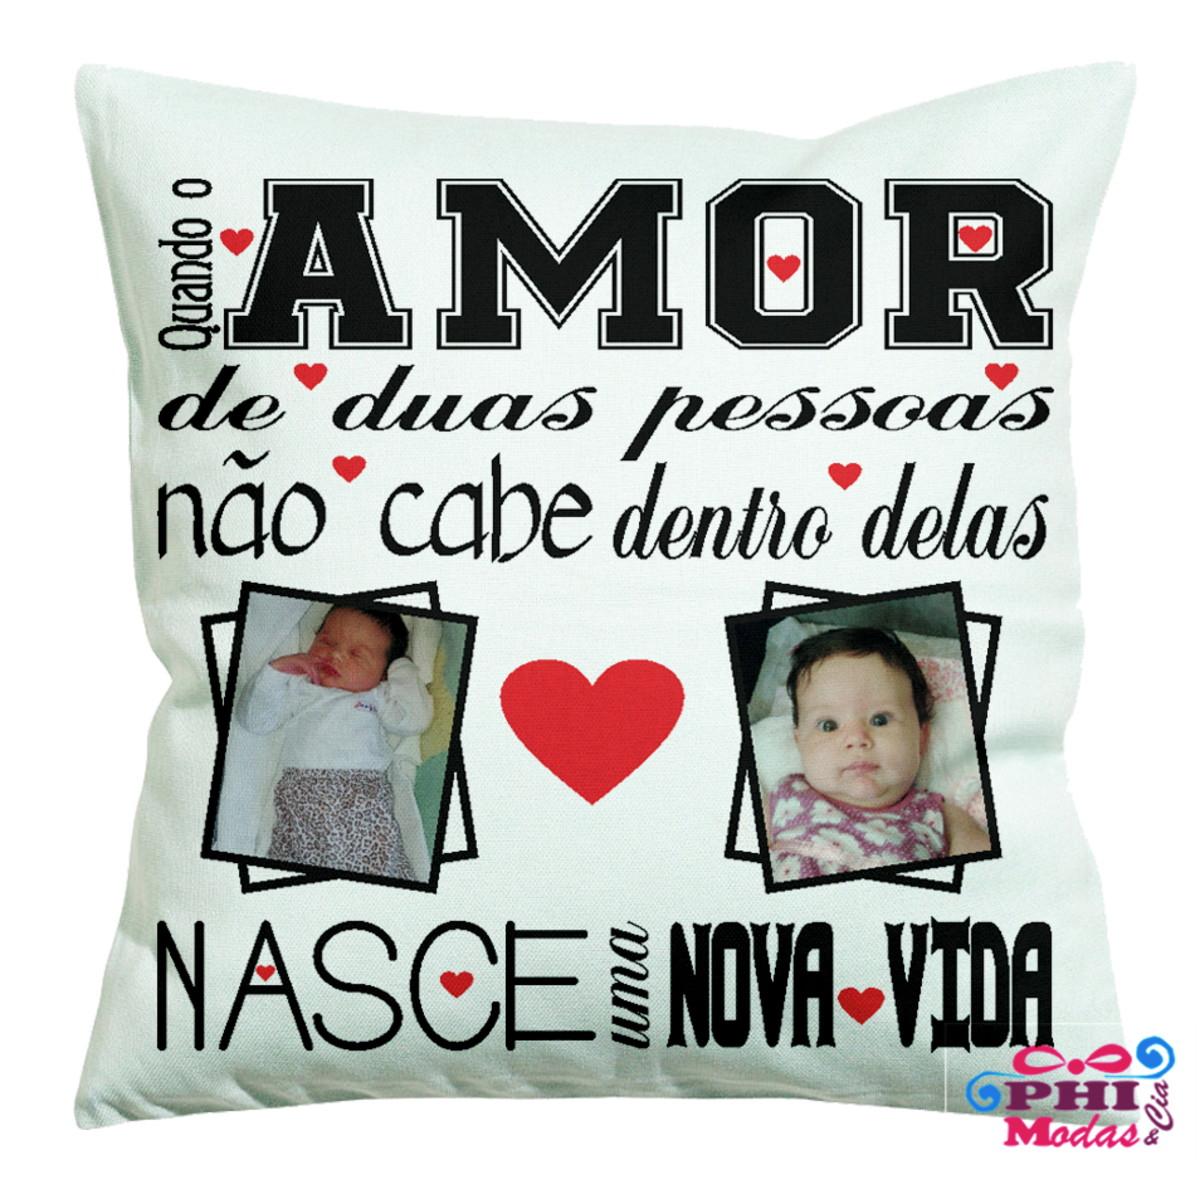 fbcbe86527e640 Presente Aniversário De Namoro Almofada Personalizada